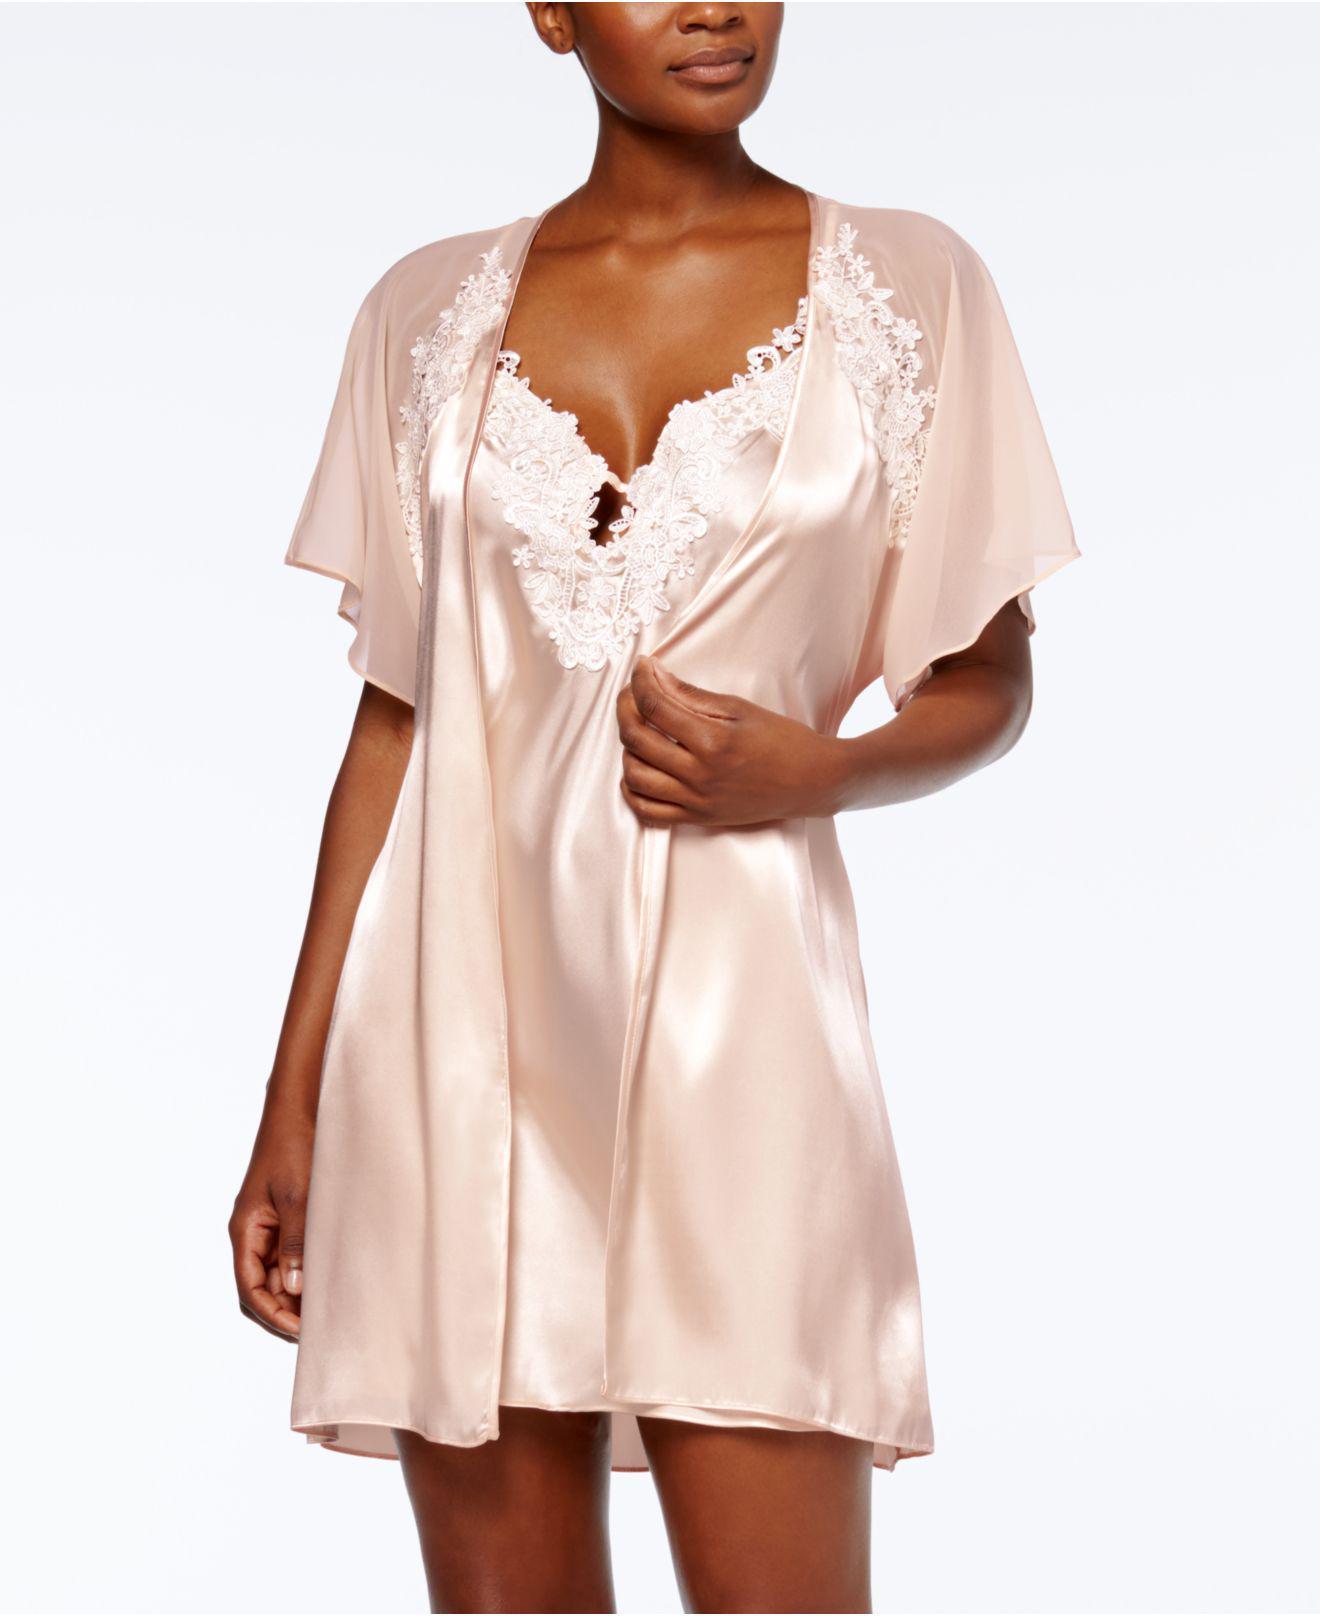 4204d637d9 Linea Donatella Satin Secret Love Wrap Robe in Pink - Lyst